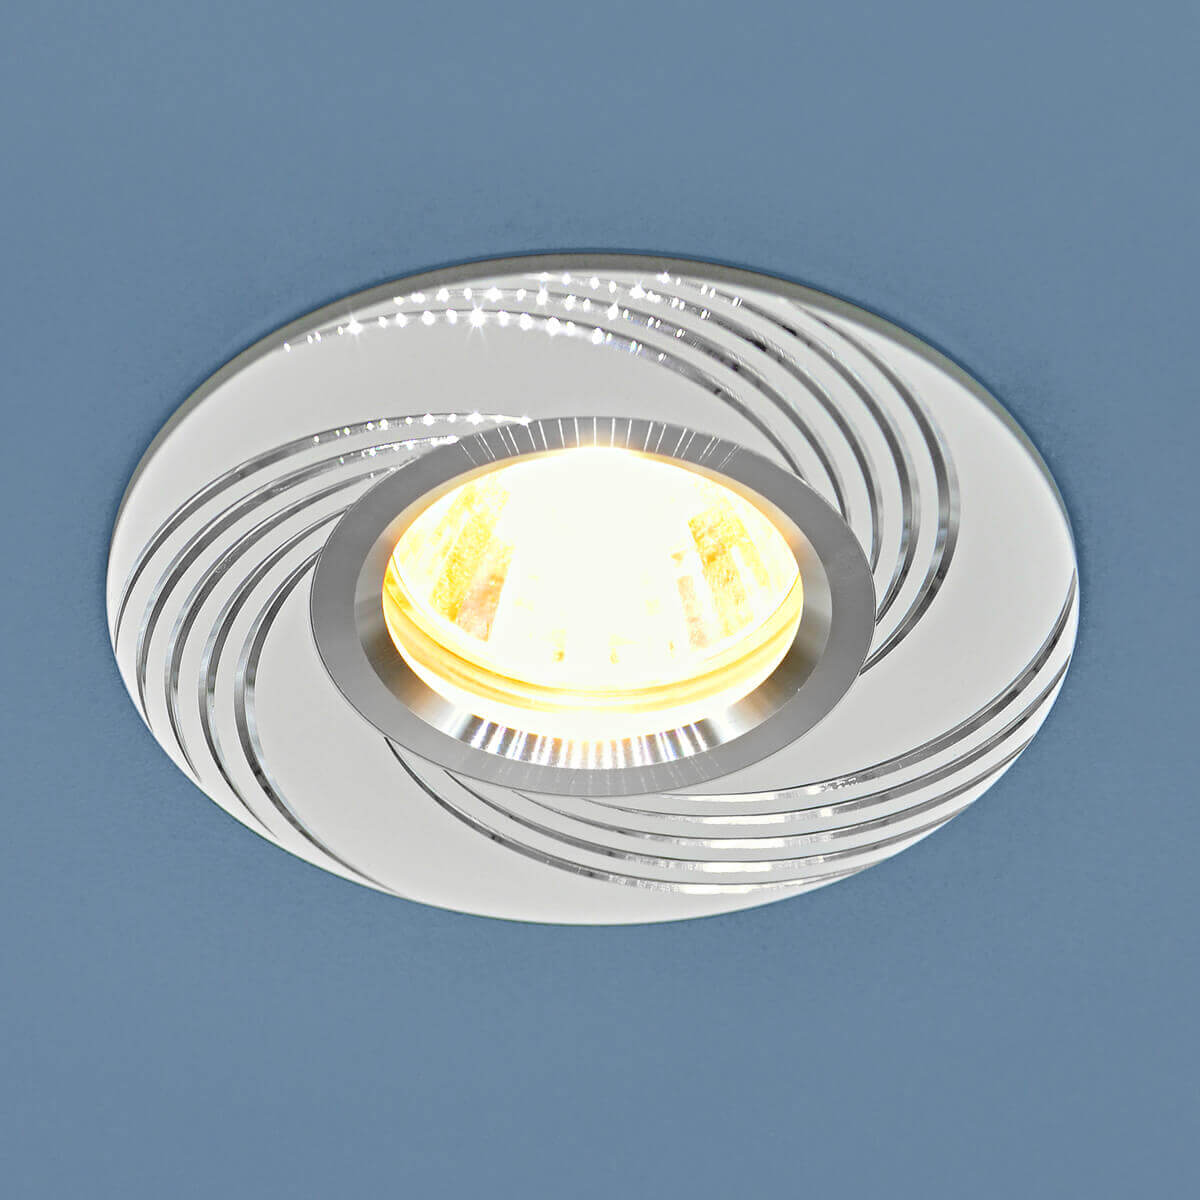 Светильник Elektrostandard 4690389081378 5156 фото